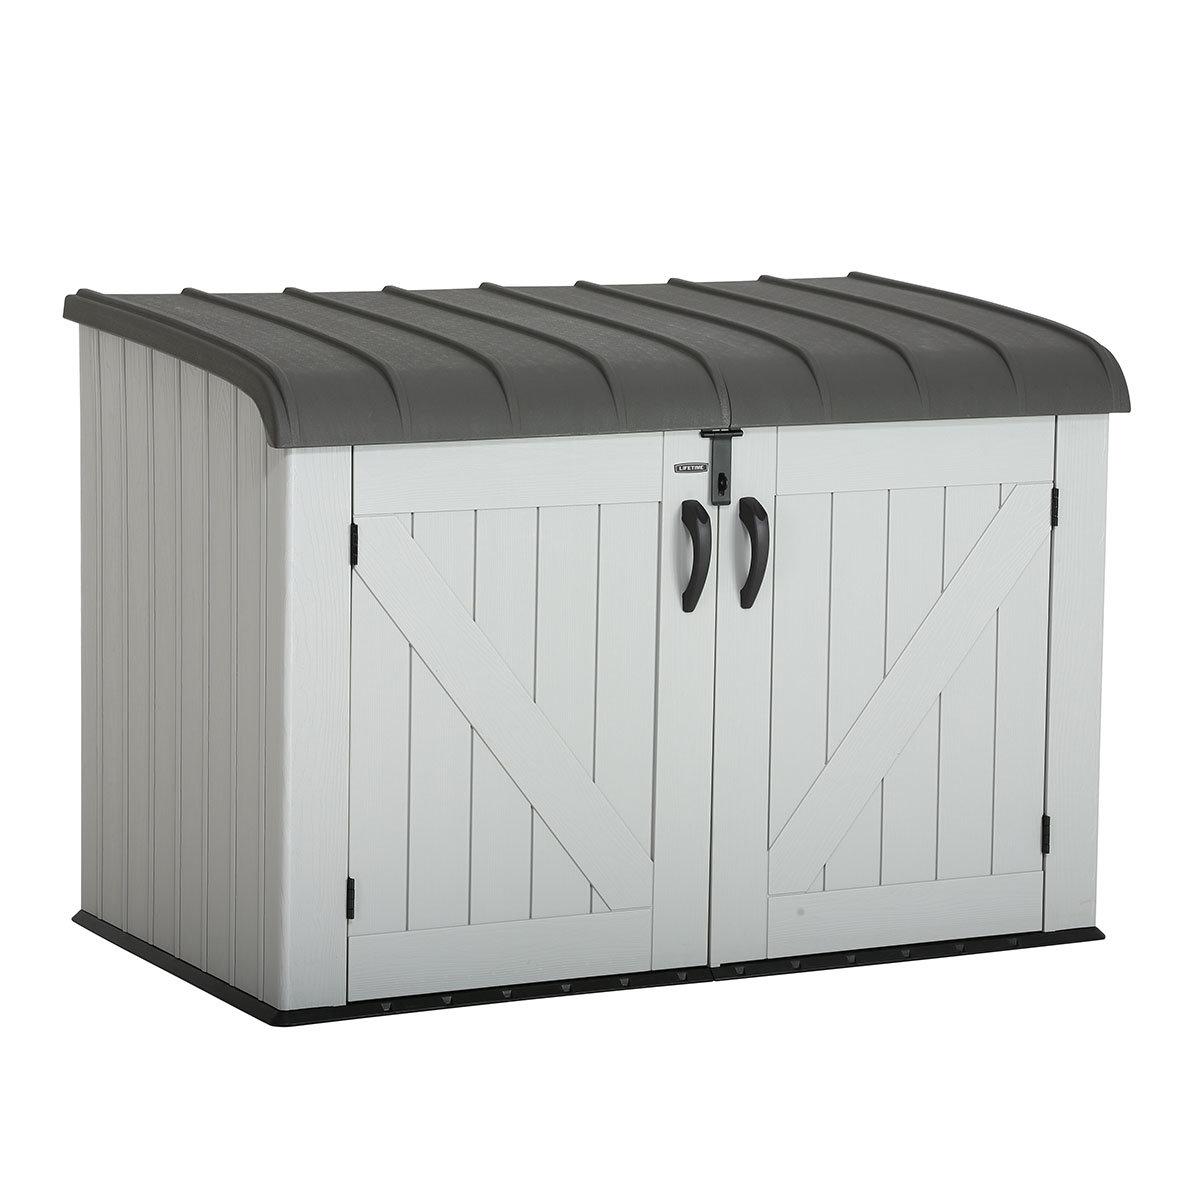 Gerätebox-Mülltonnenbox, 132x191x108 cm, grau